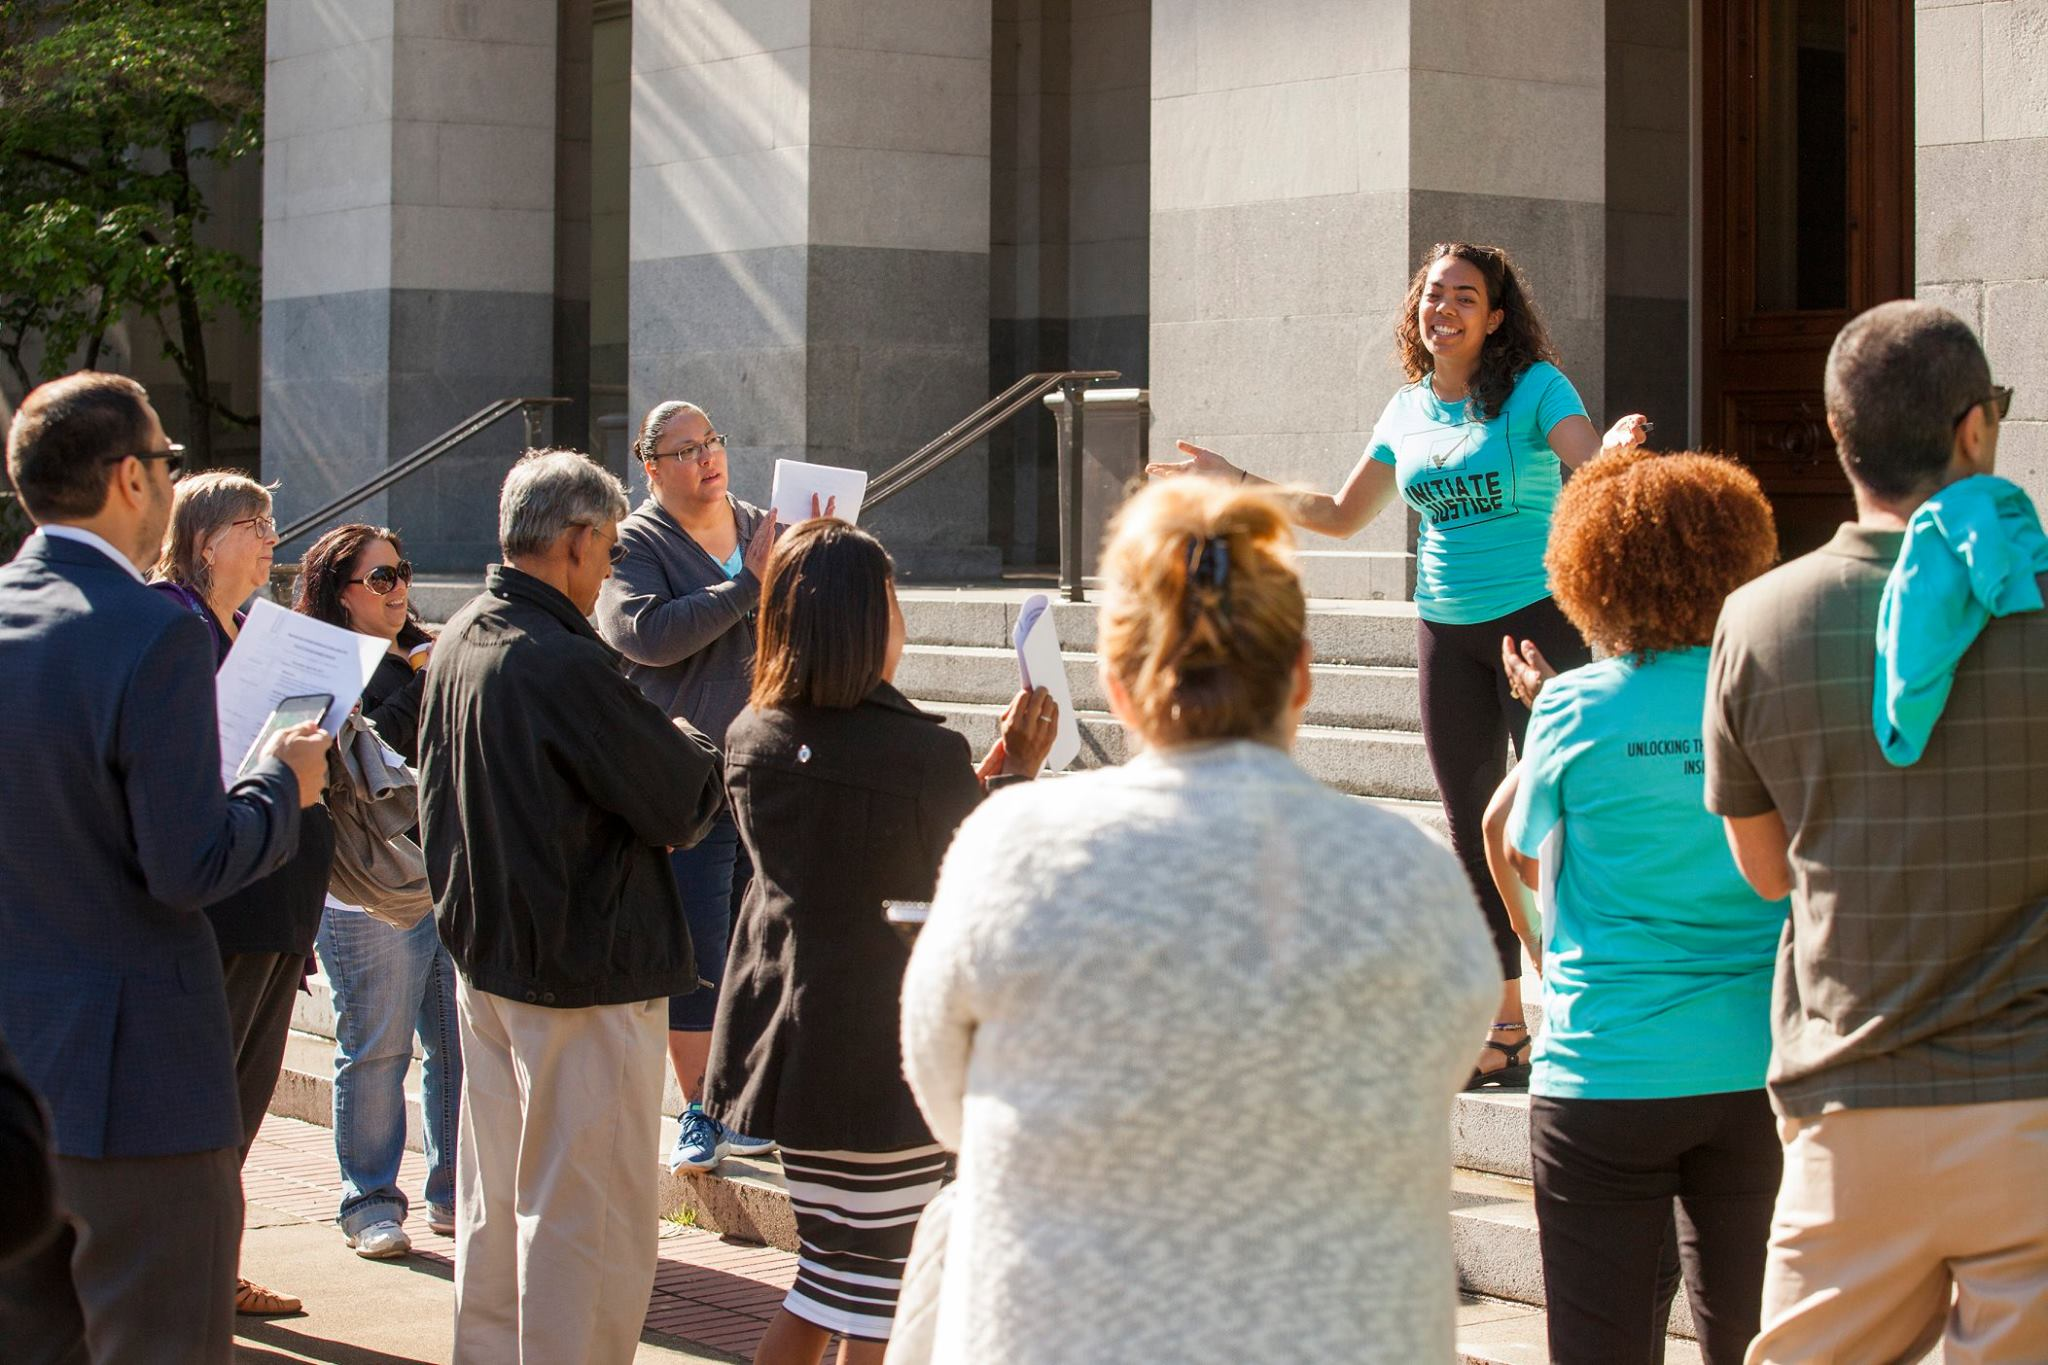 Chicago Tribune: Voting Restoration and Democracy Act Coverage